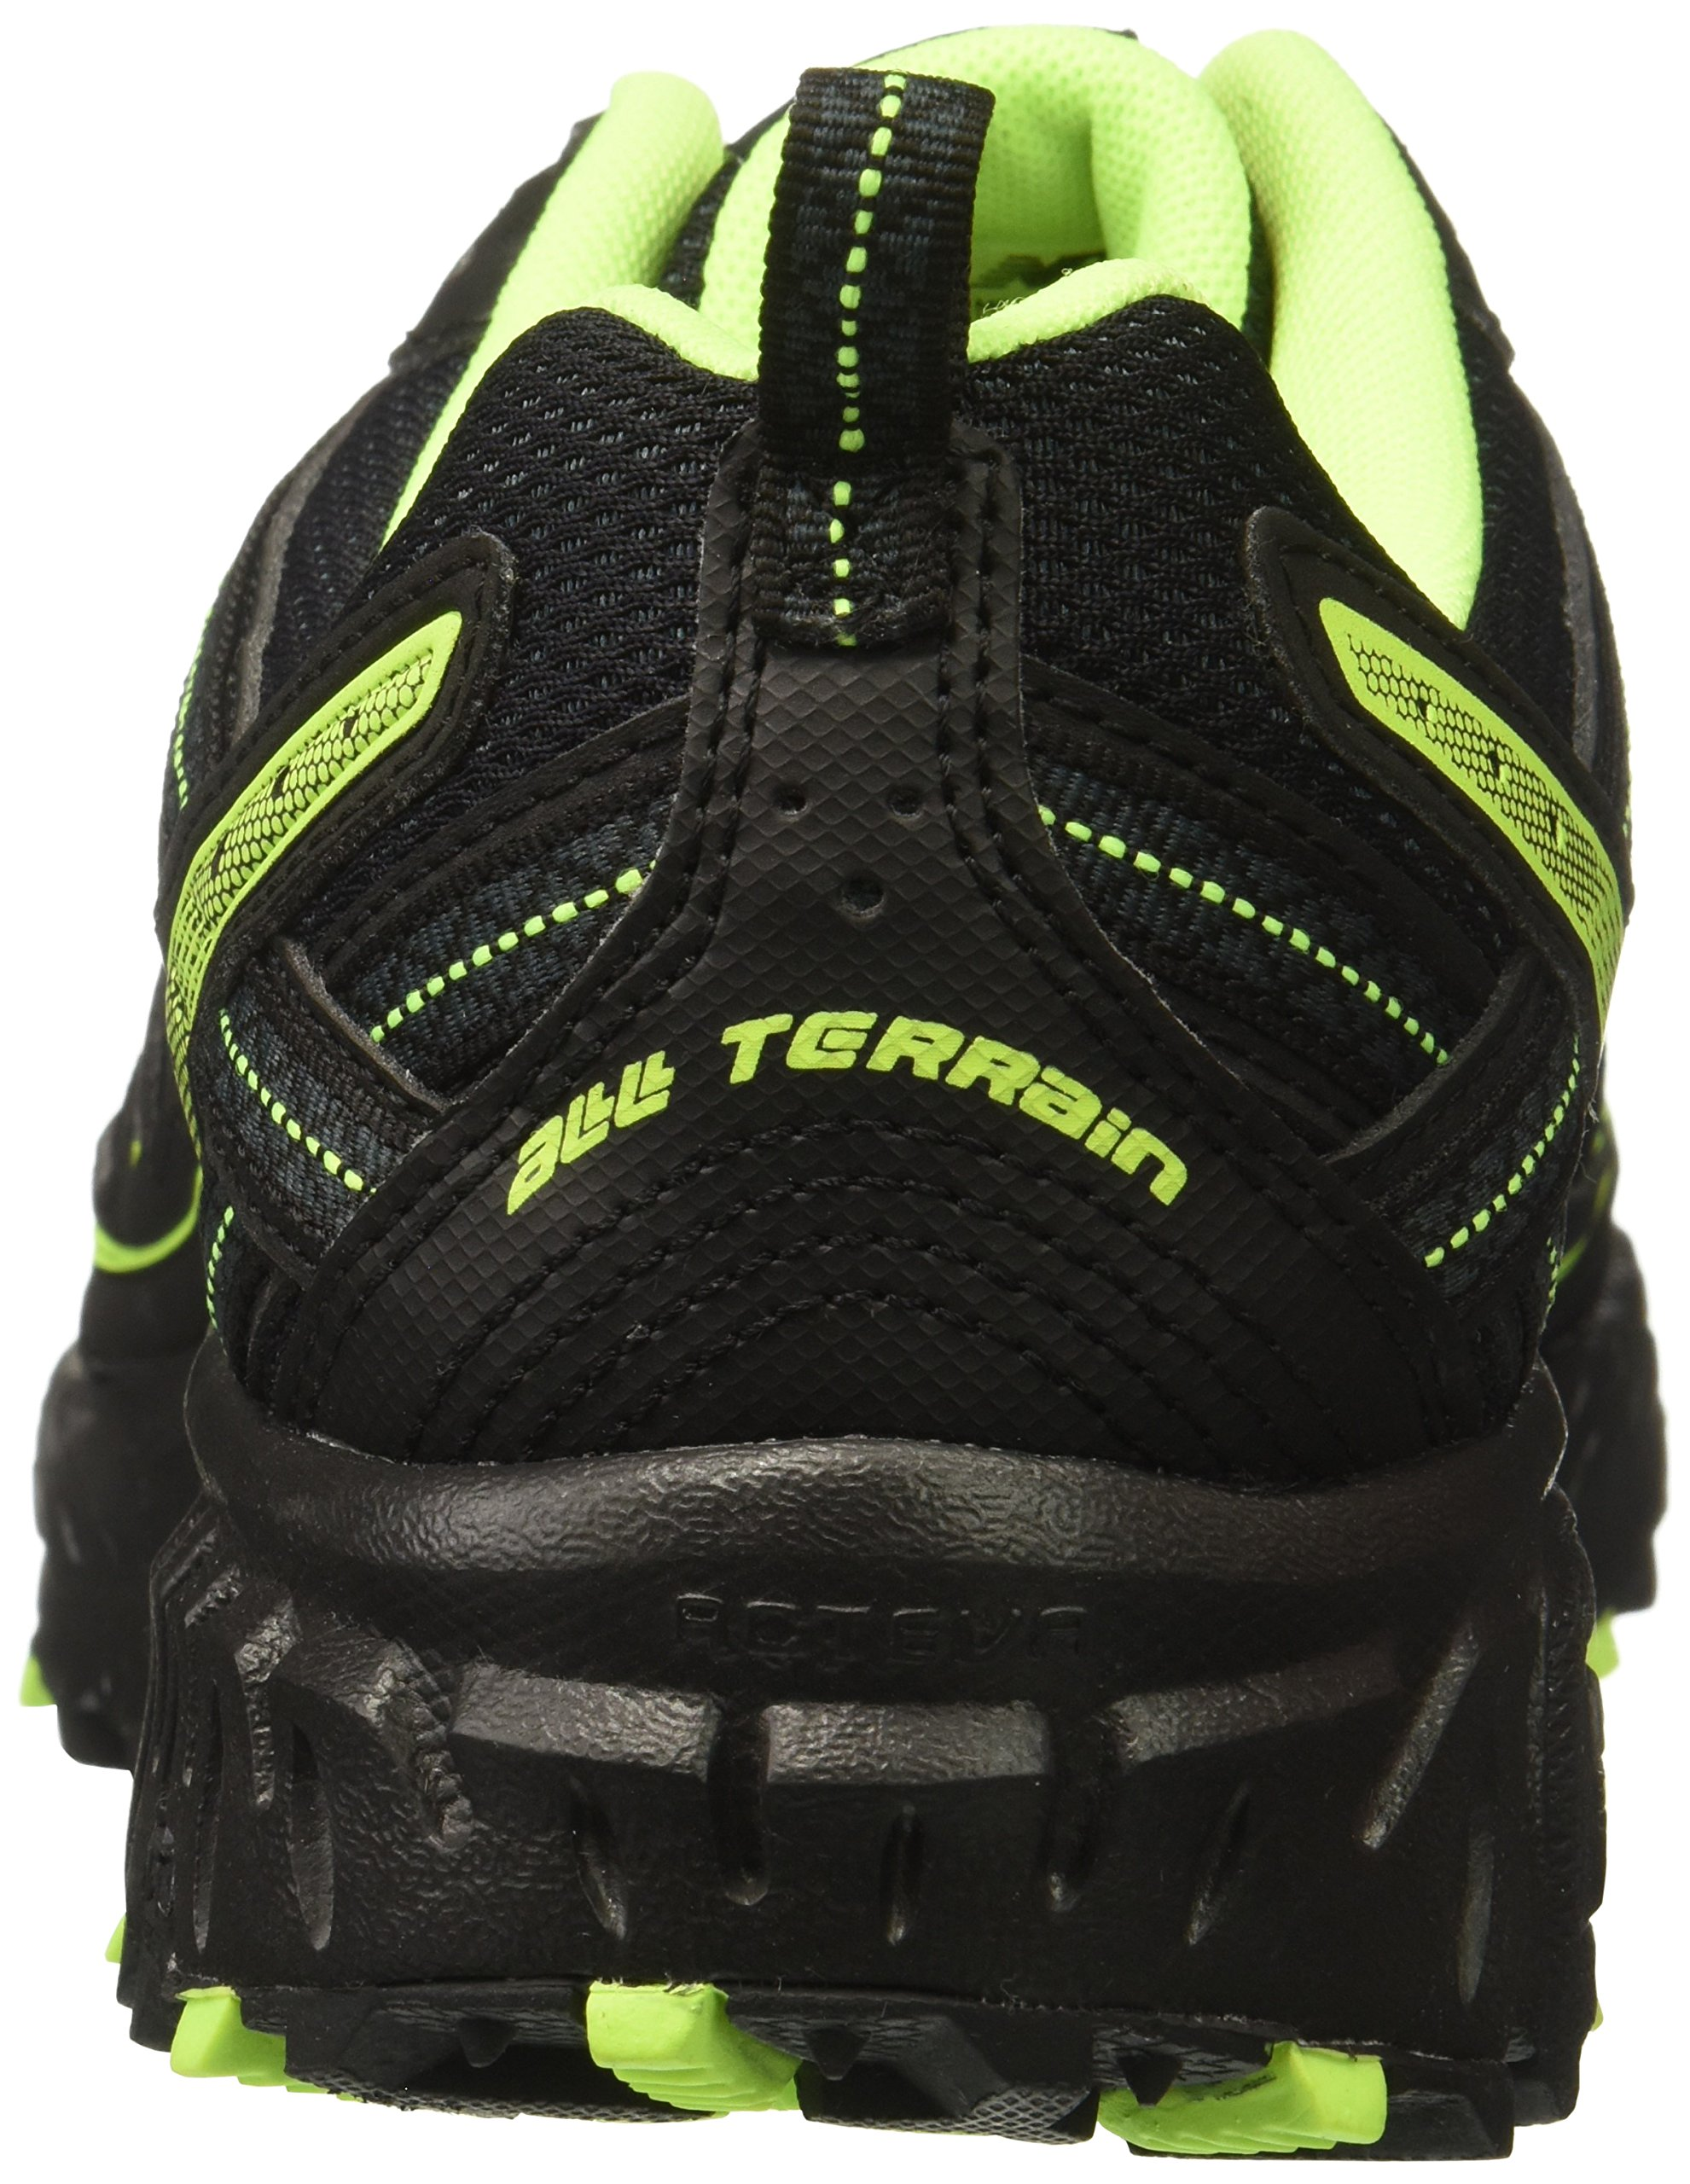 New Balance Men's MT410v5 Cushioning Trail Running Shoe, Black, 8 D US by New Balance (Image #2)